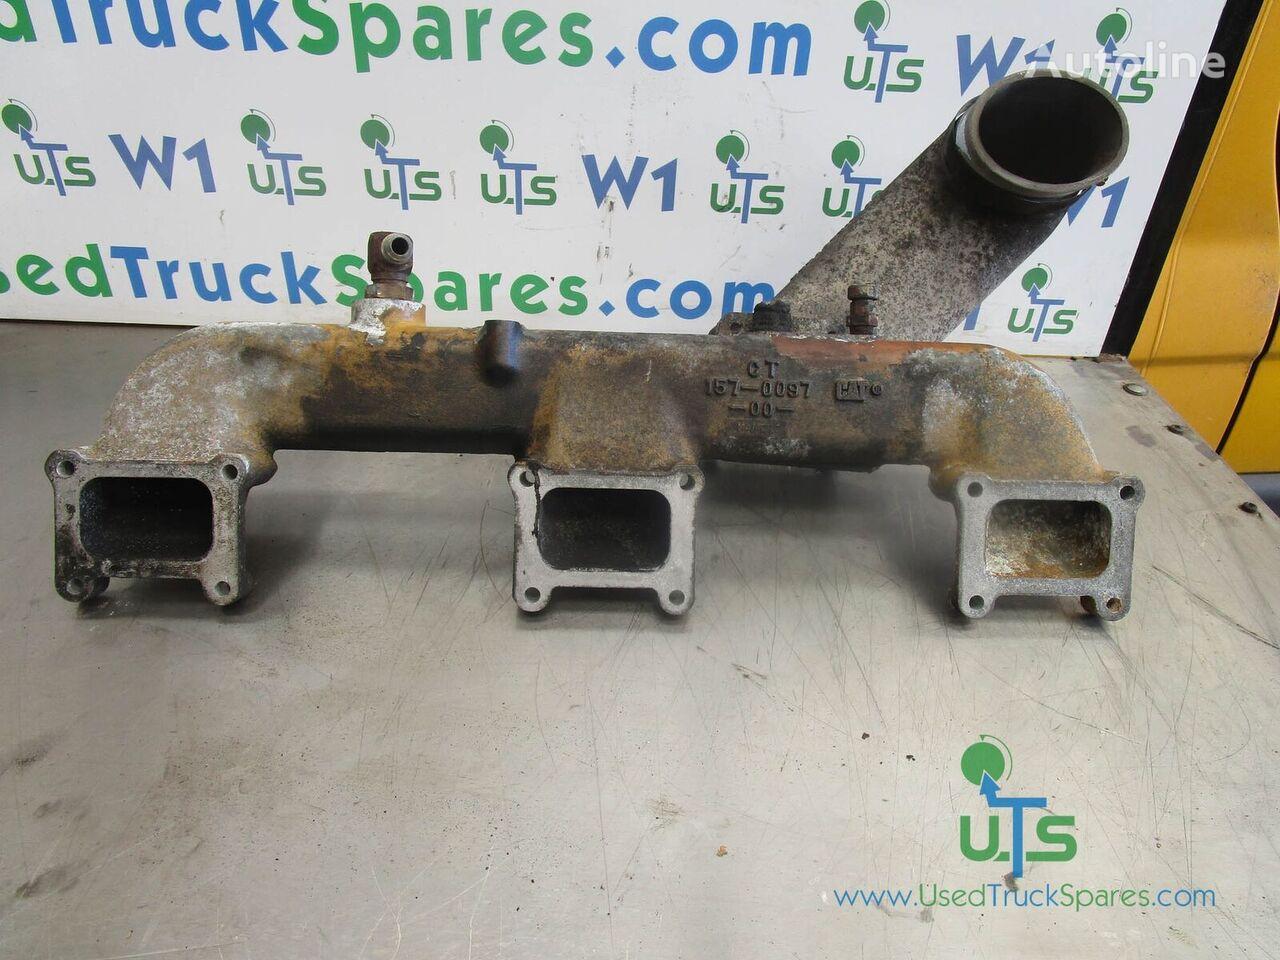 CATERPILLAR C10 / C12 P/NO (157-0097) manifold for truck